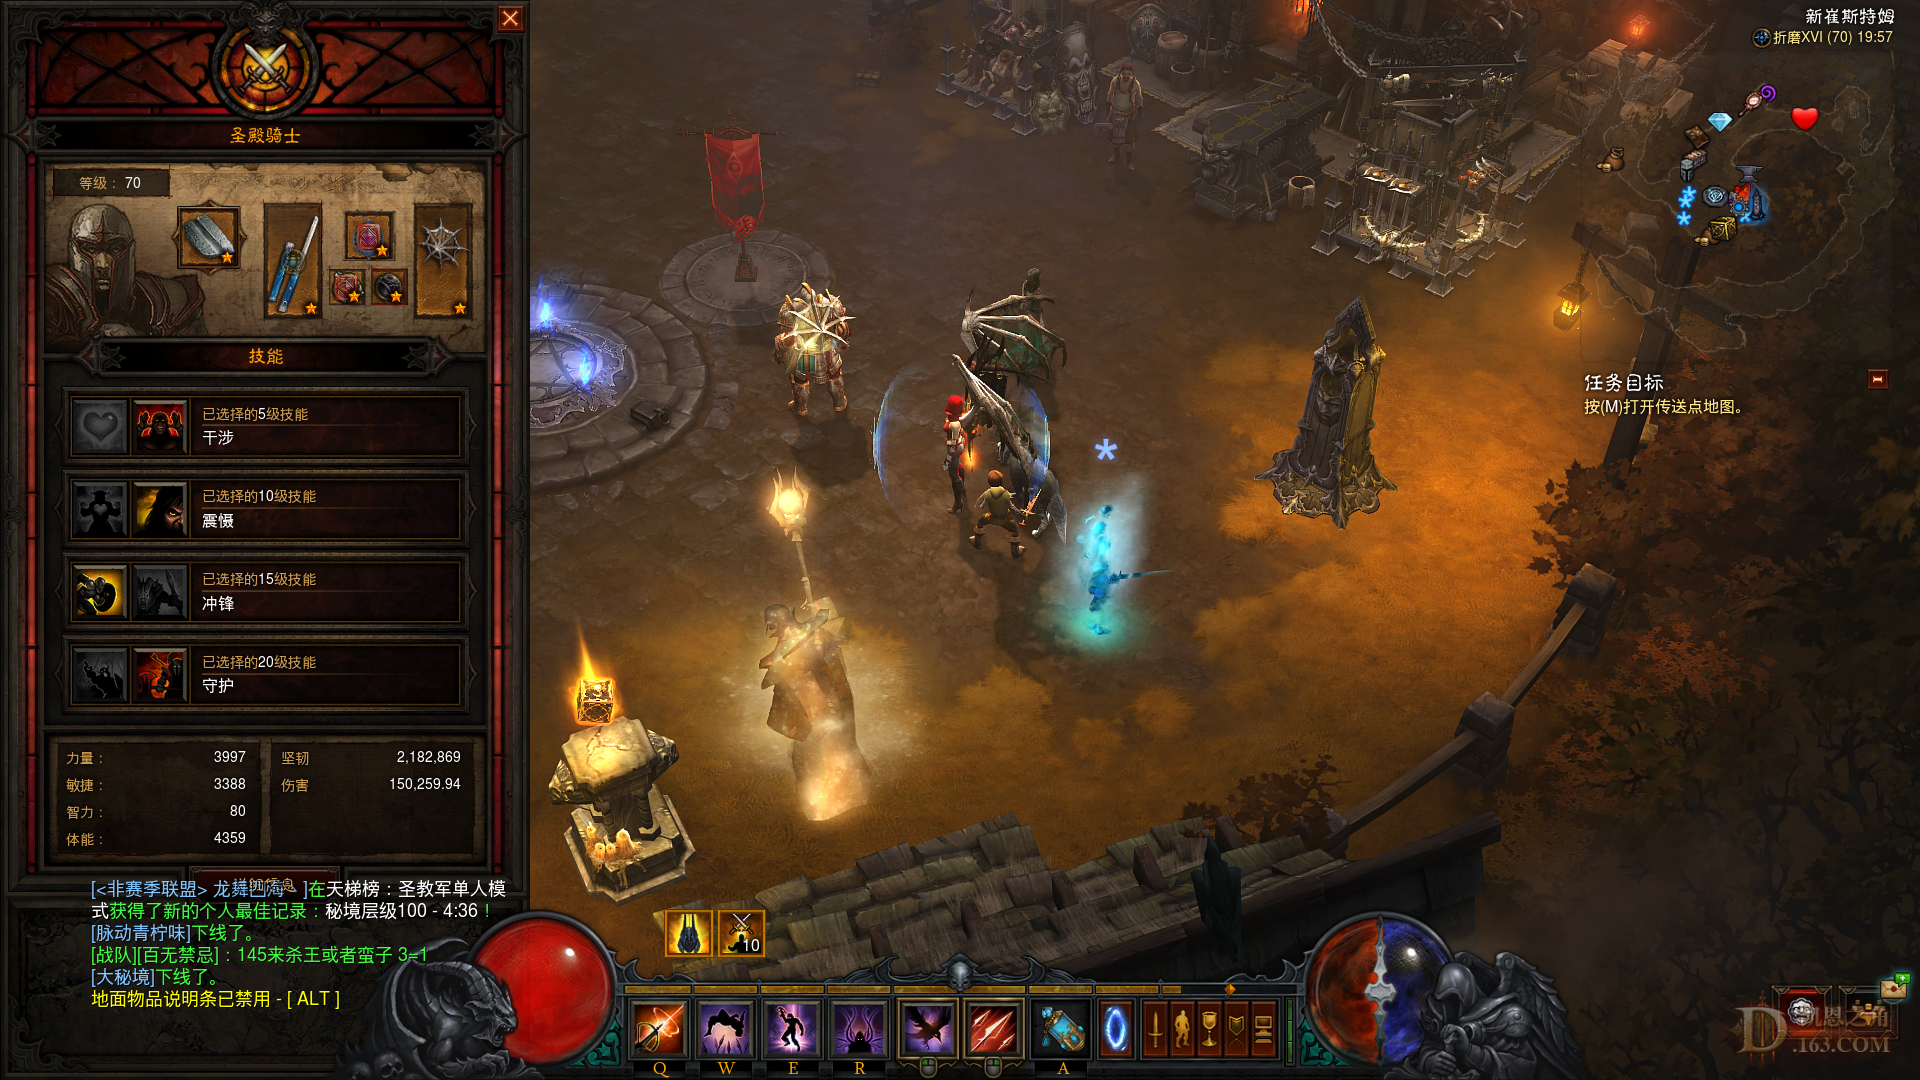 Diablo III Screenshot 2019.11.16 - 19.57.03.55.png